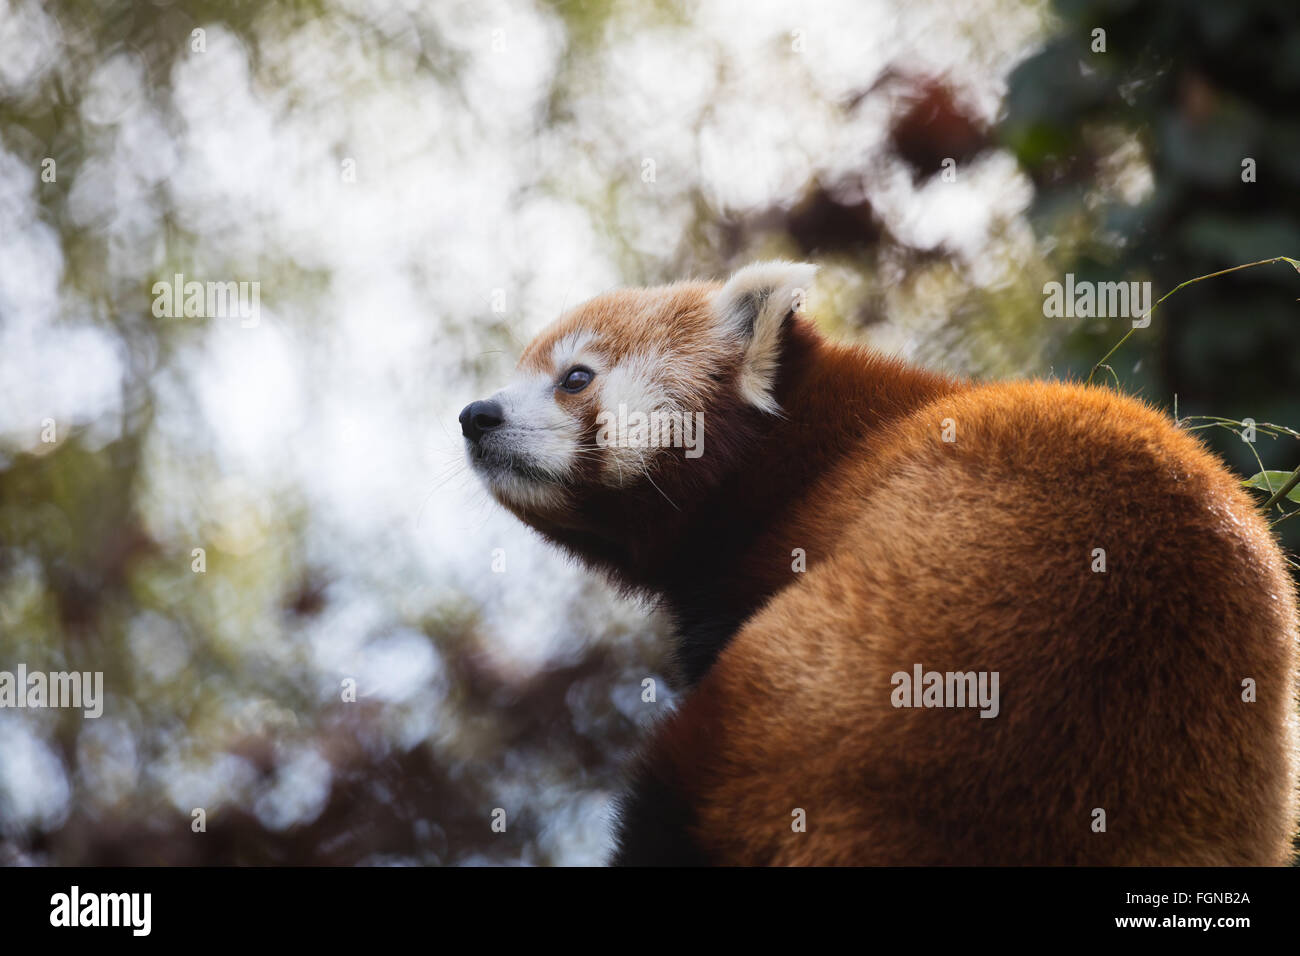 Cute Red Panda (Ailurus fulgens) looking at something Stock Photo